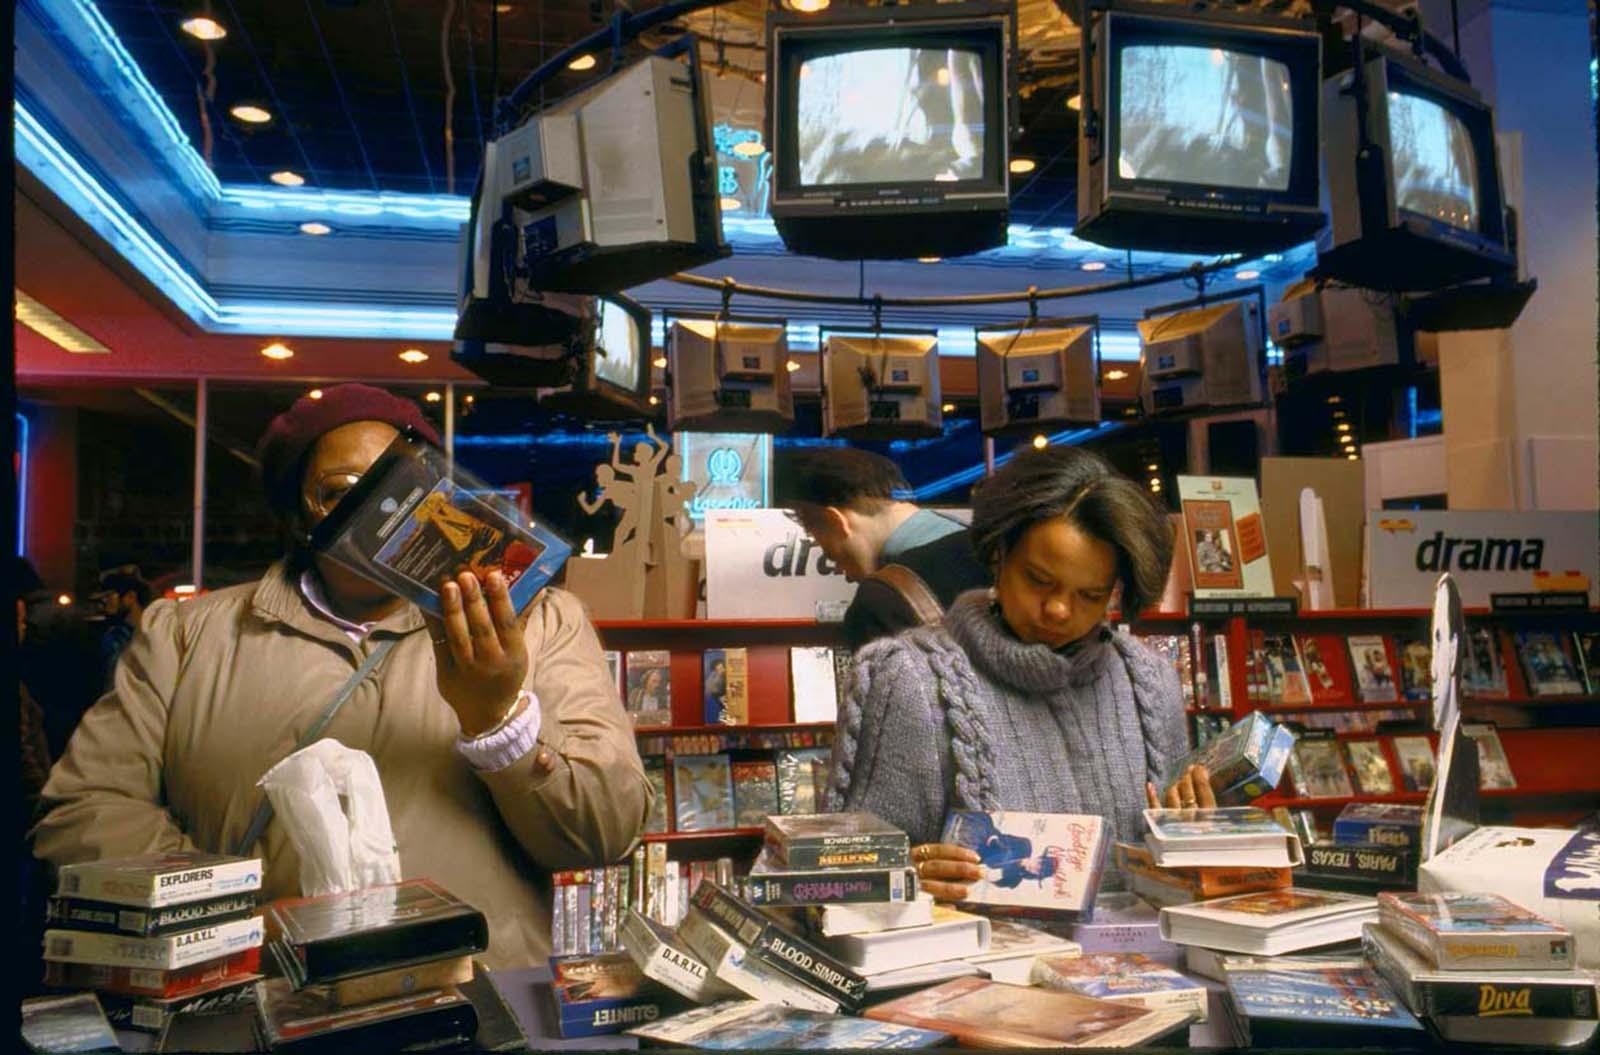 Seeking video bargains. 1986.